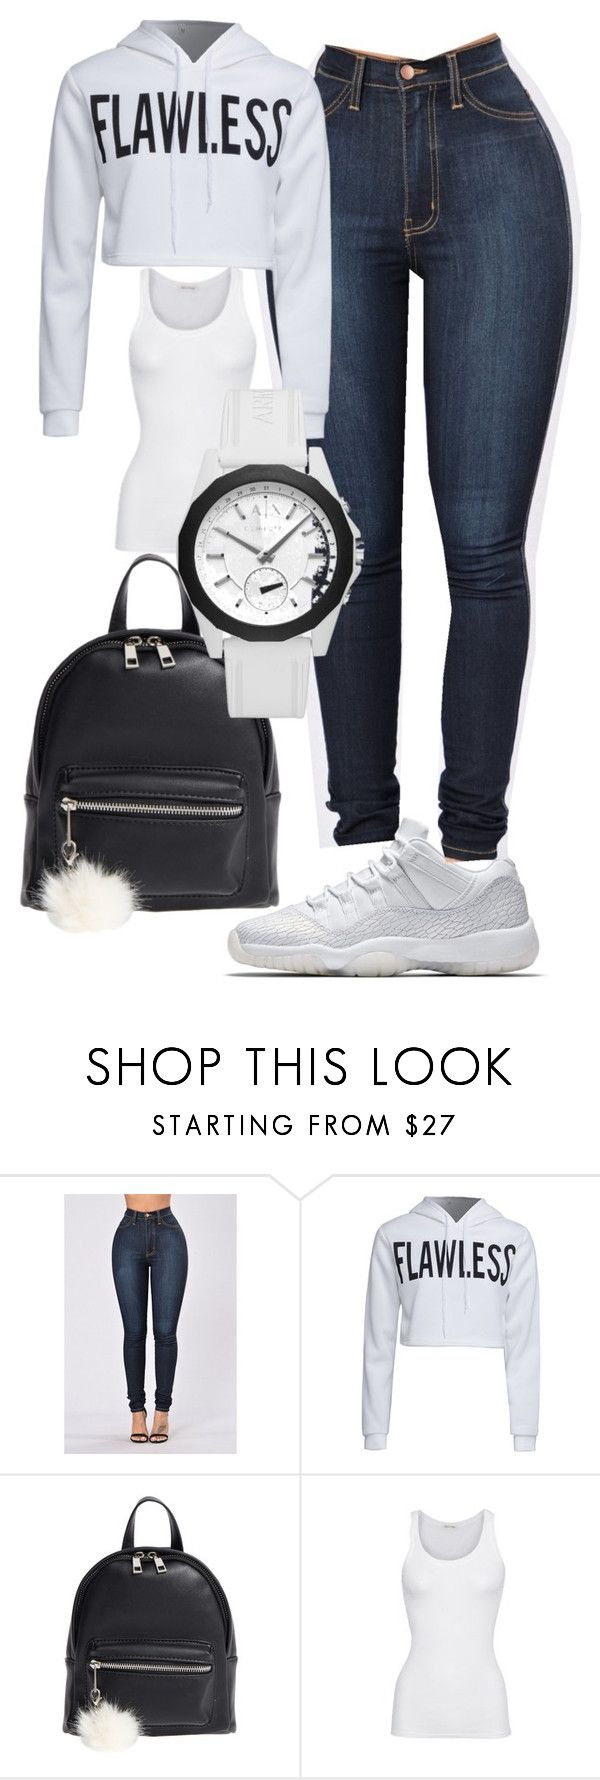 """Jordan Outfit"" by benginafantaisie on Polyvore featuring WithChic, BP., American Vintage, Armani Exchange, white, Air, jordan, fashionova and Jordanoutfit"